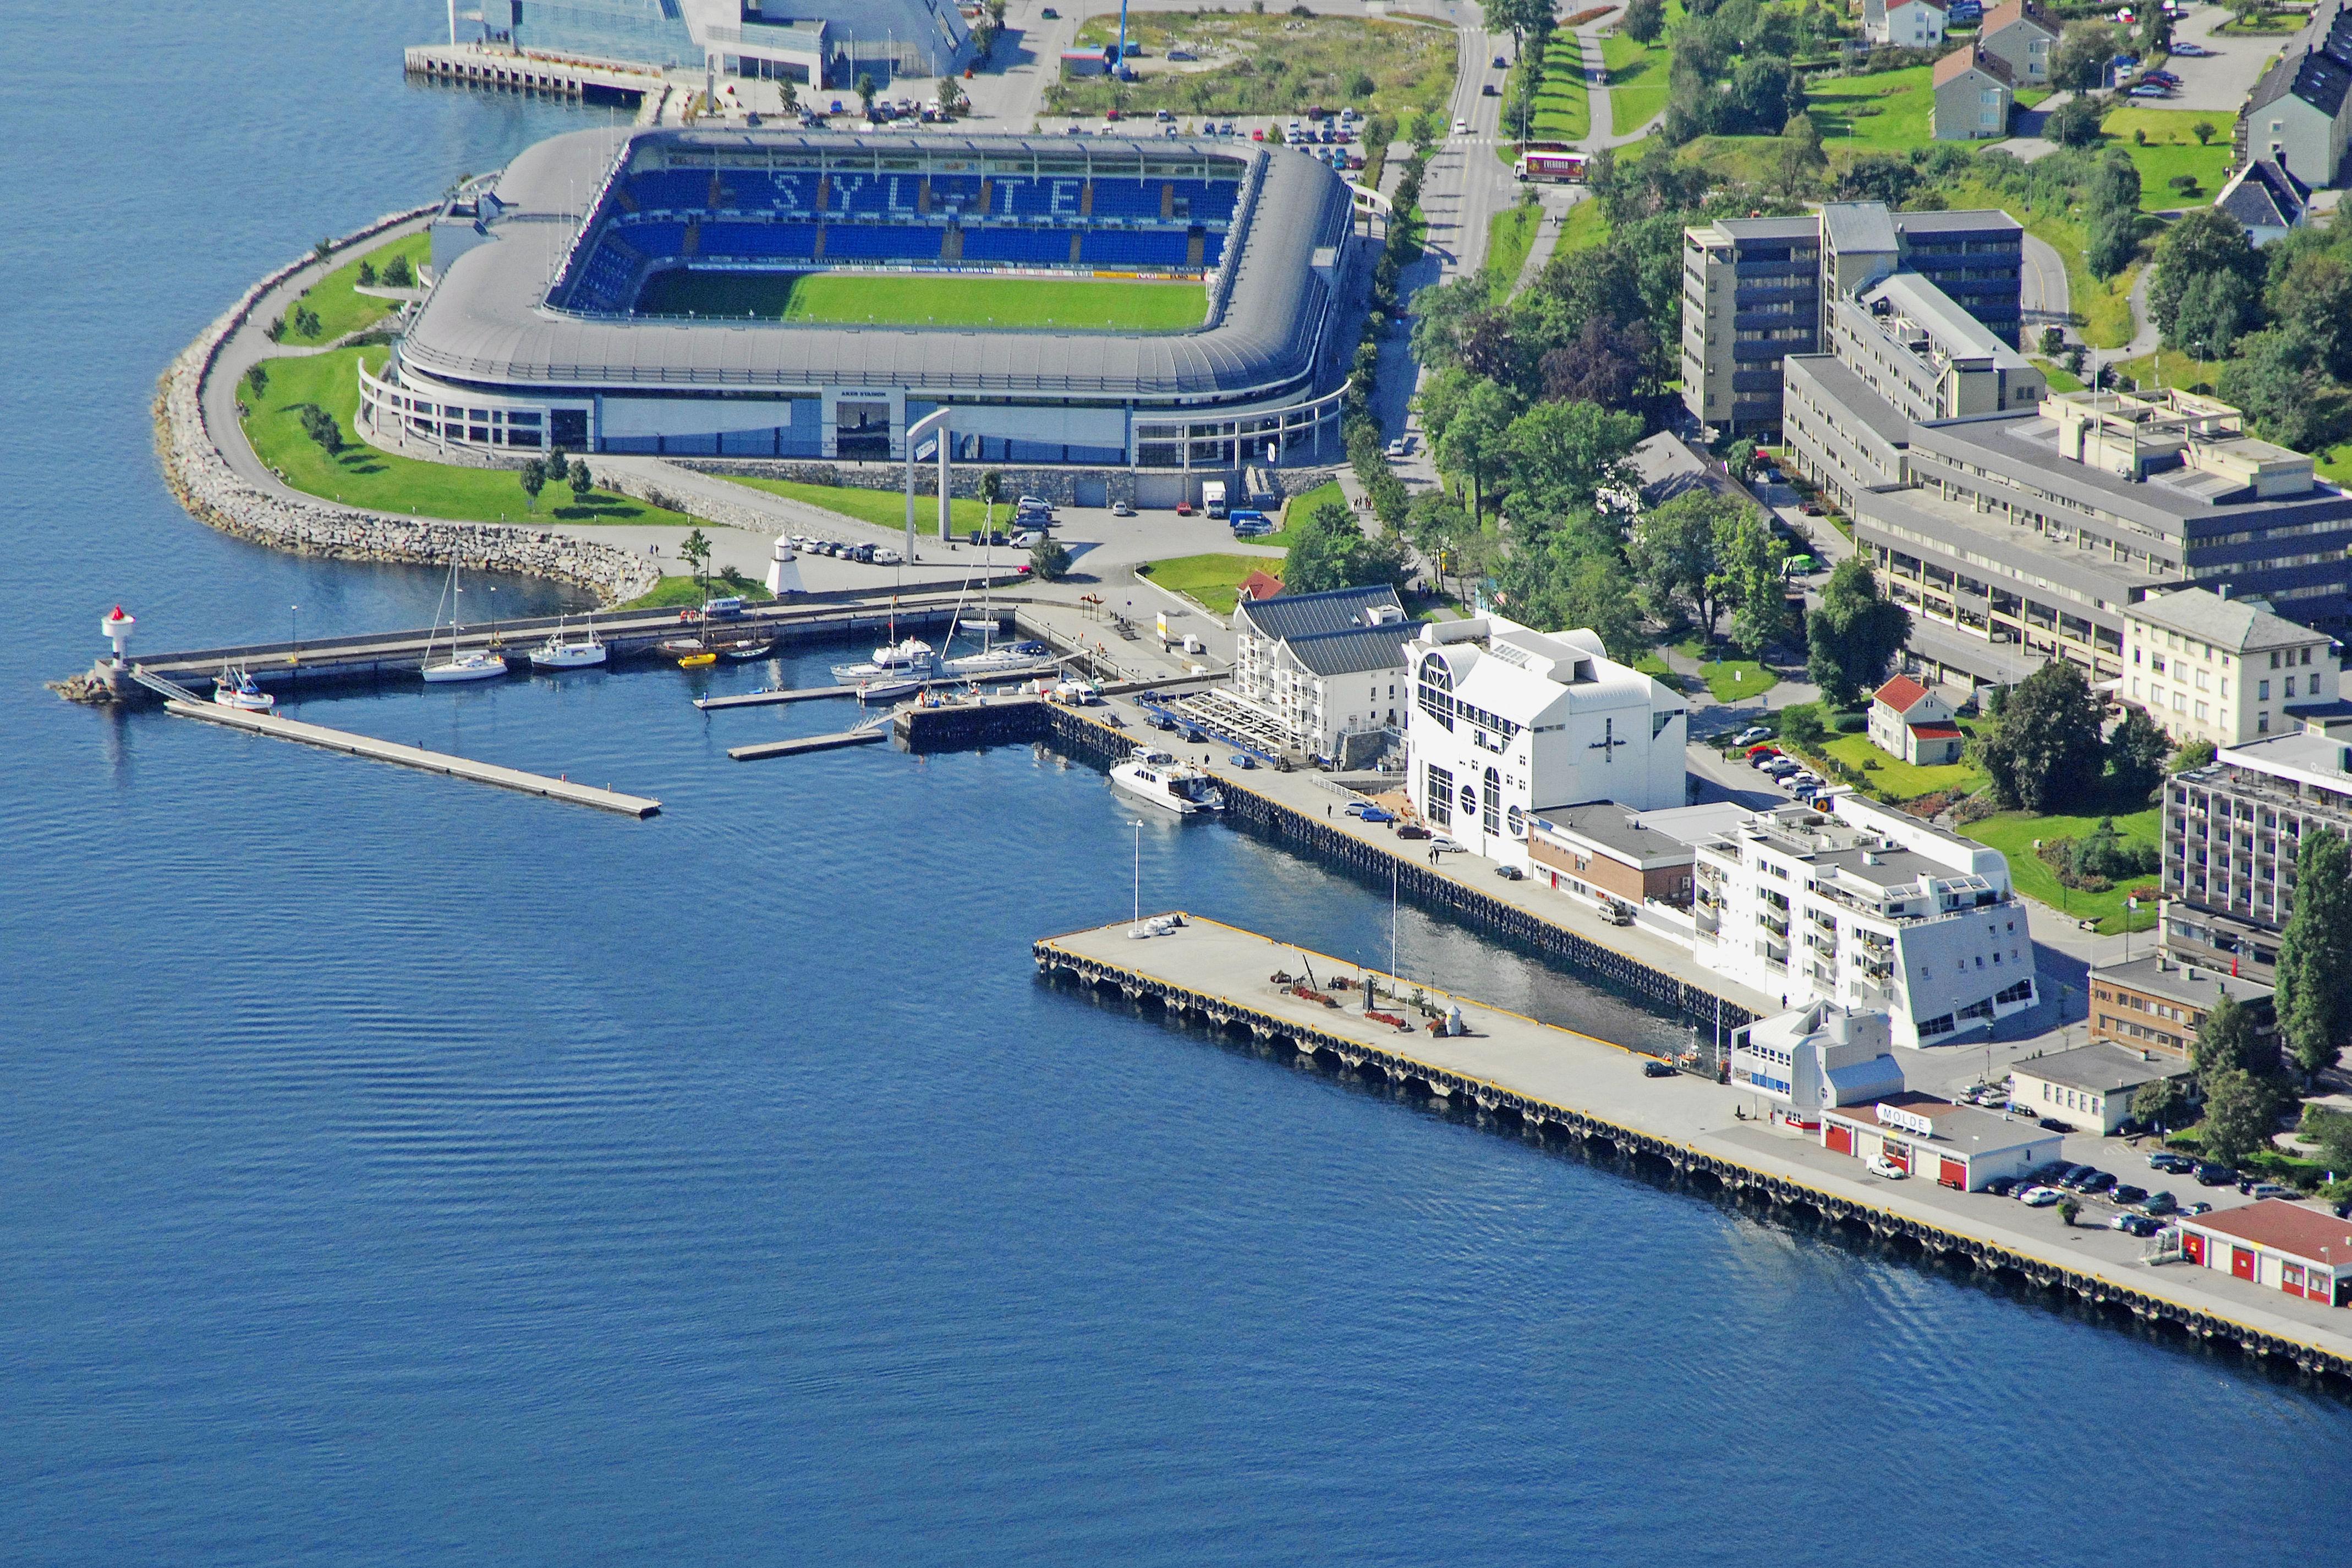 molde reknes harbour in molde norway marina reviews phone